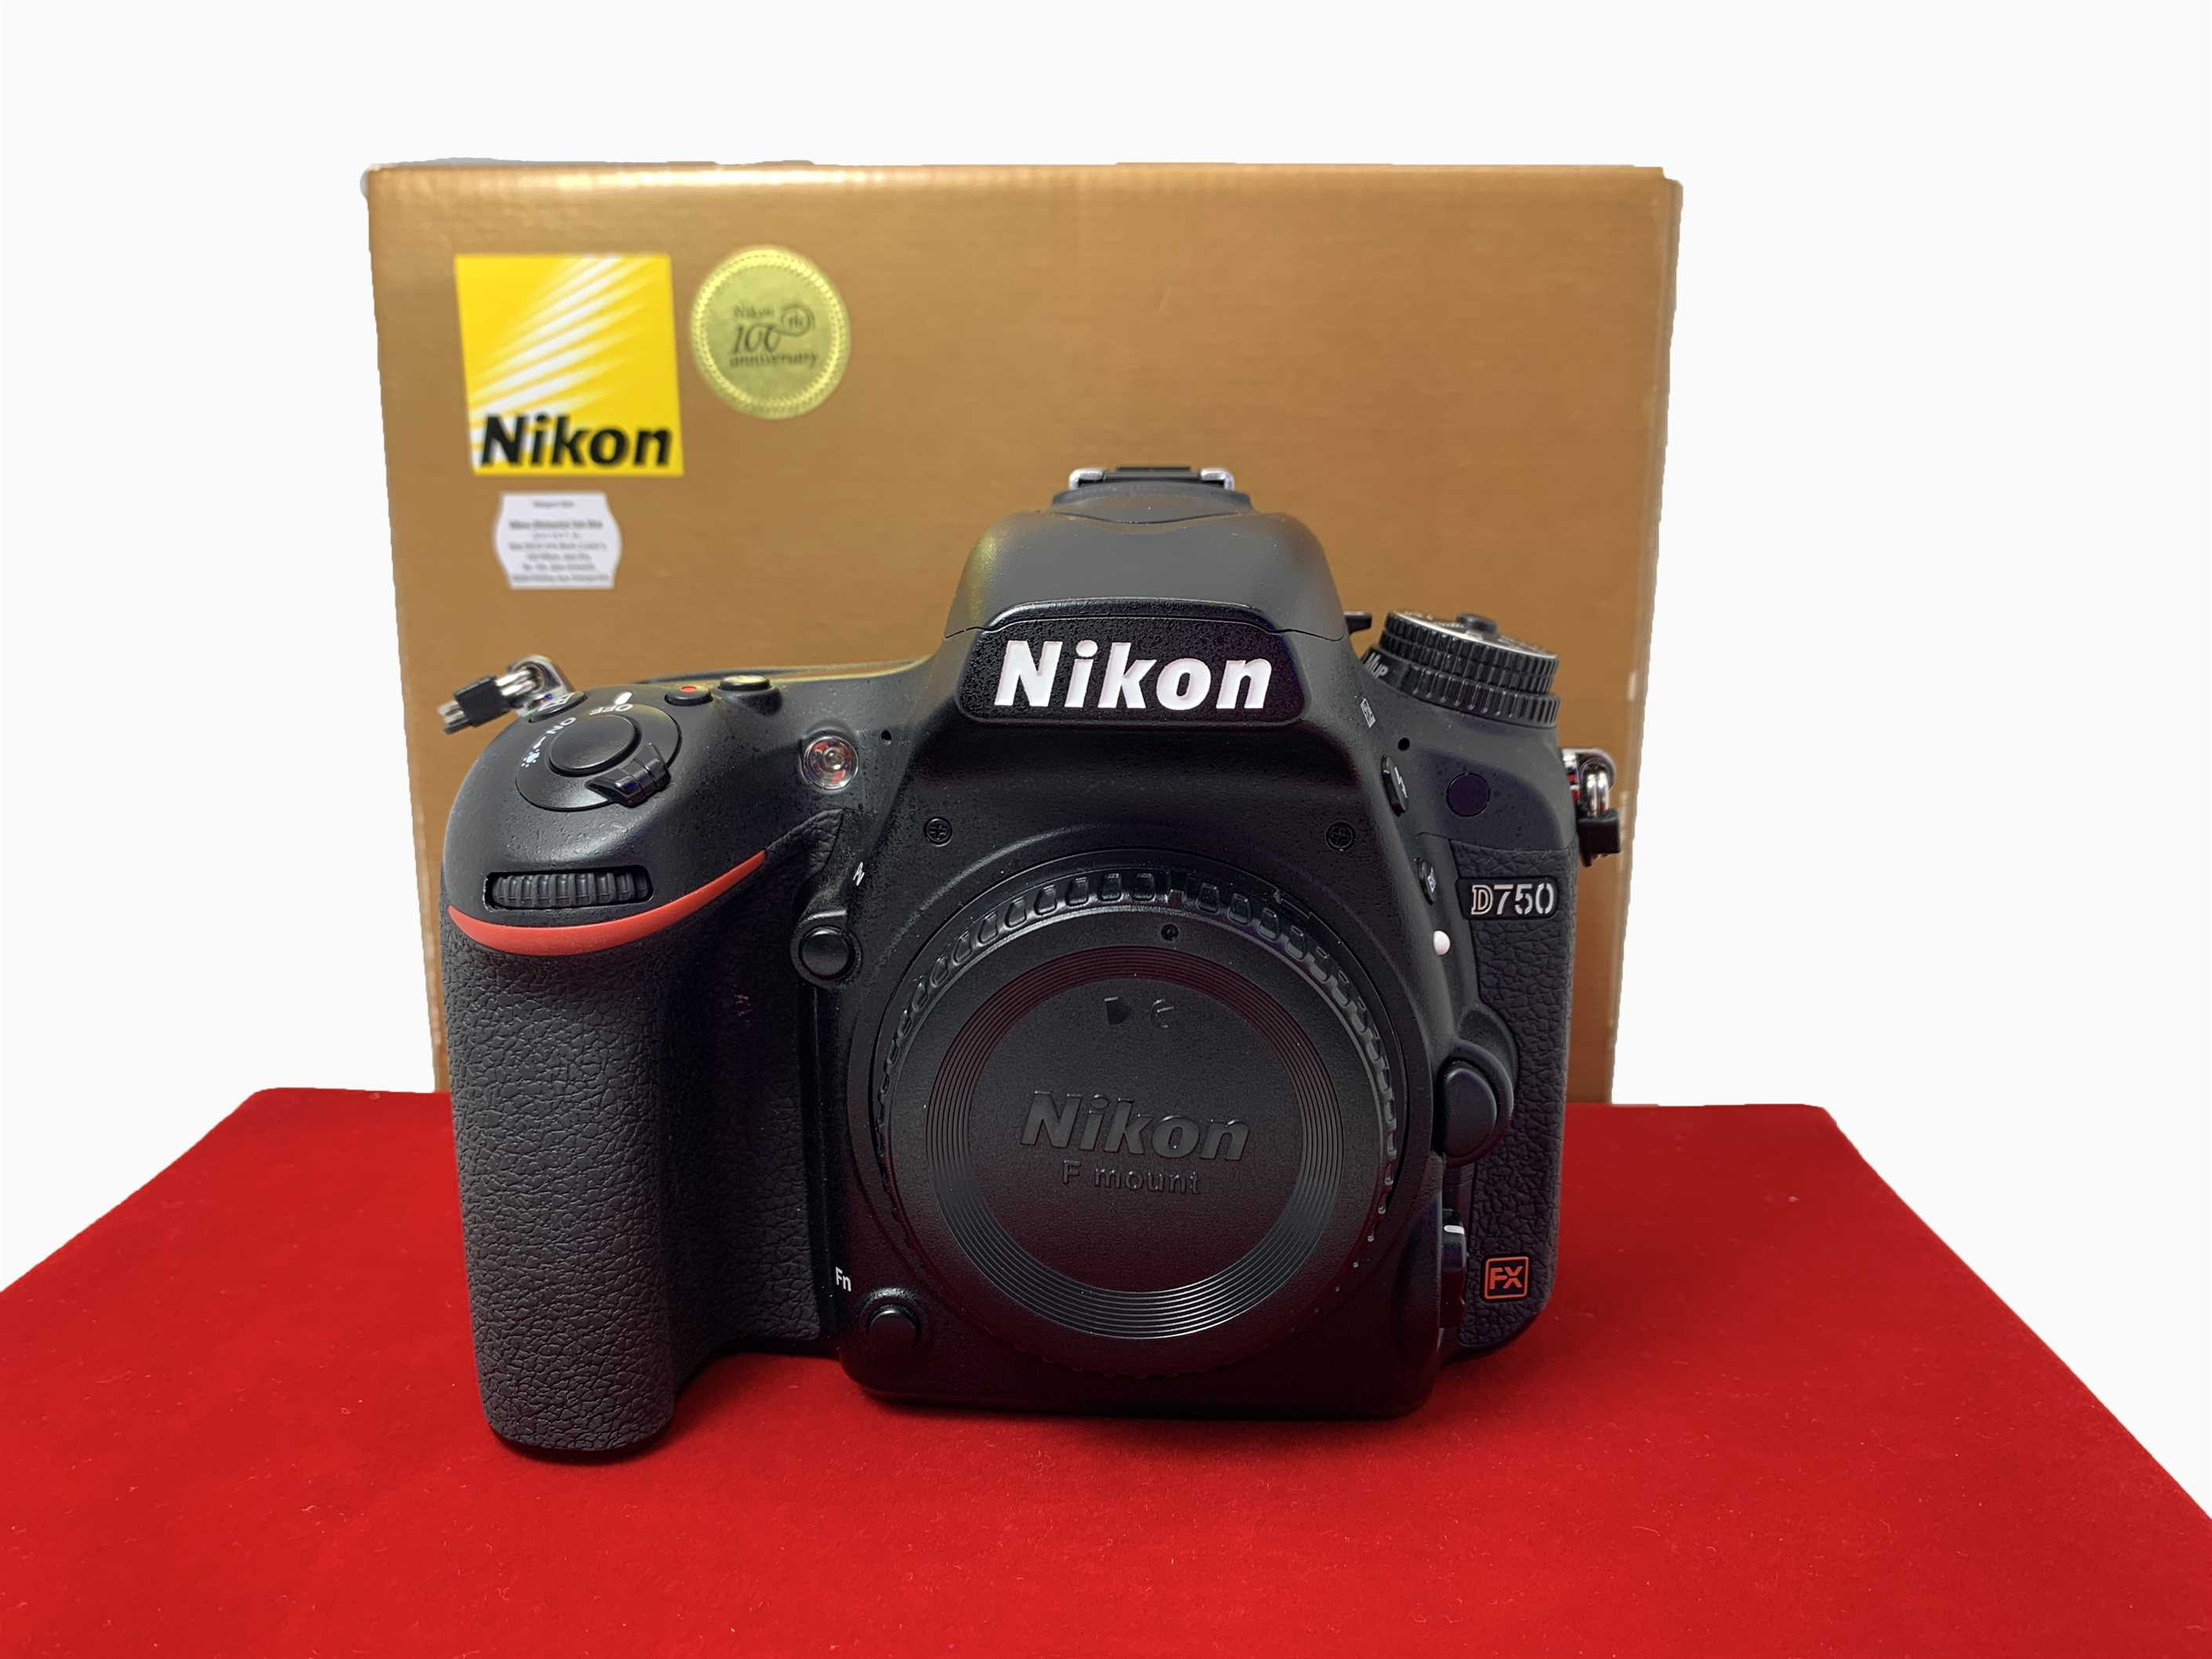 [USED-PJ33] Nikon D750 Camera Body,90% Like New Condition (S/N:8530059)